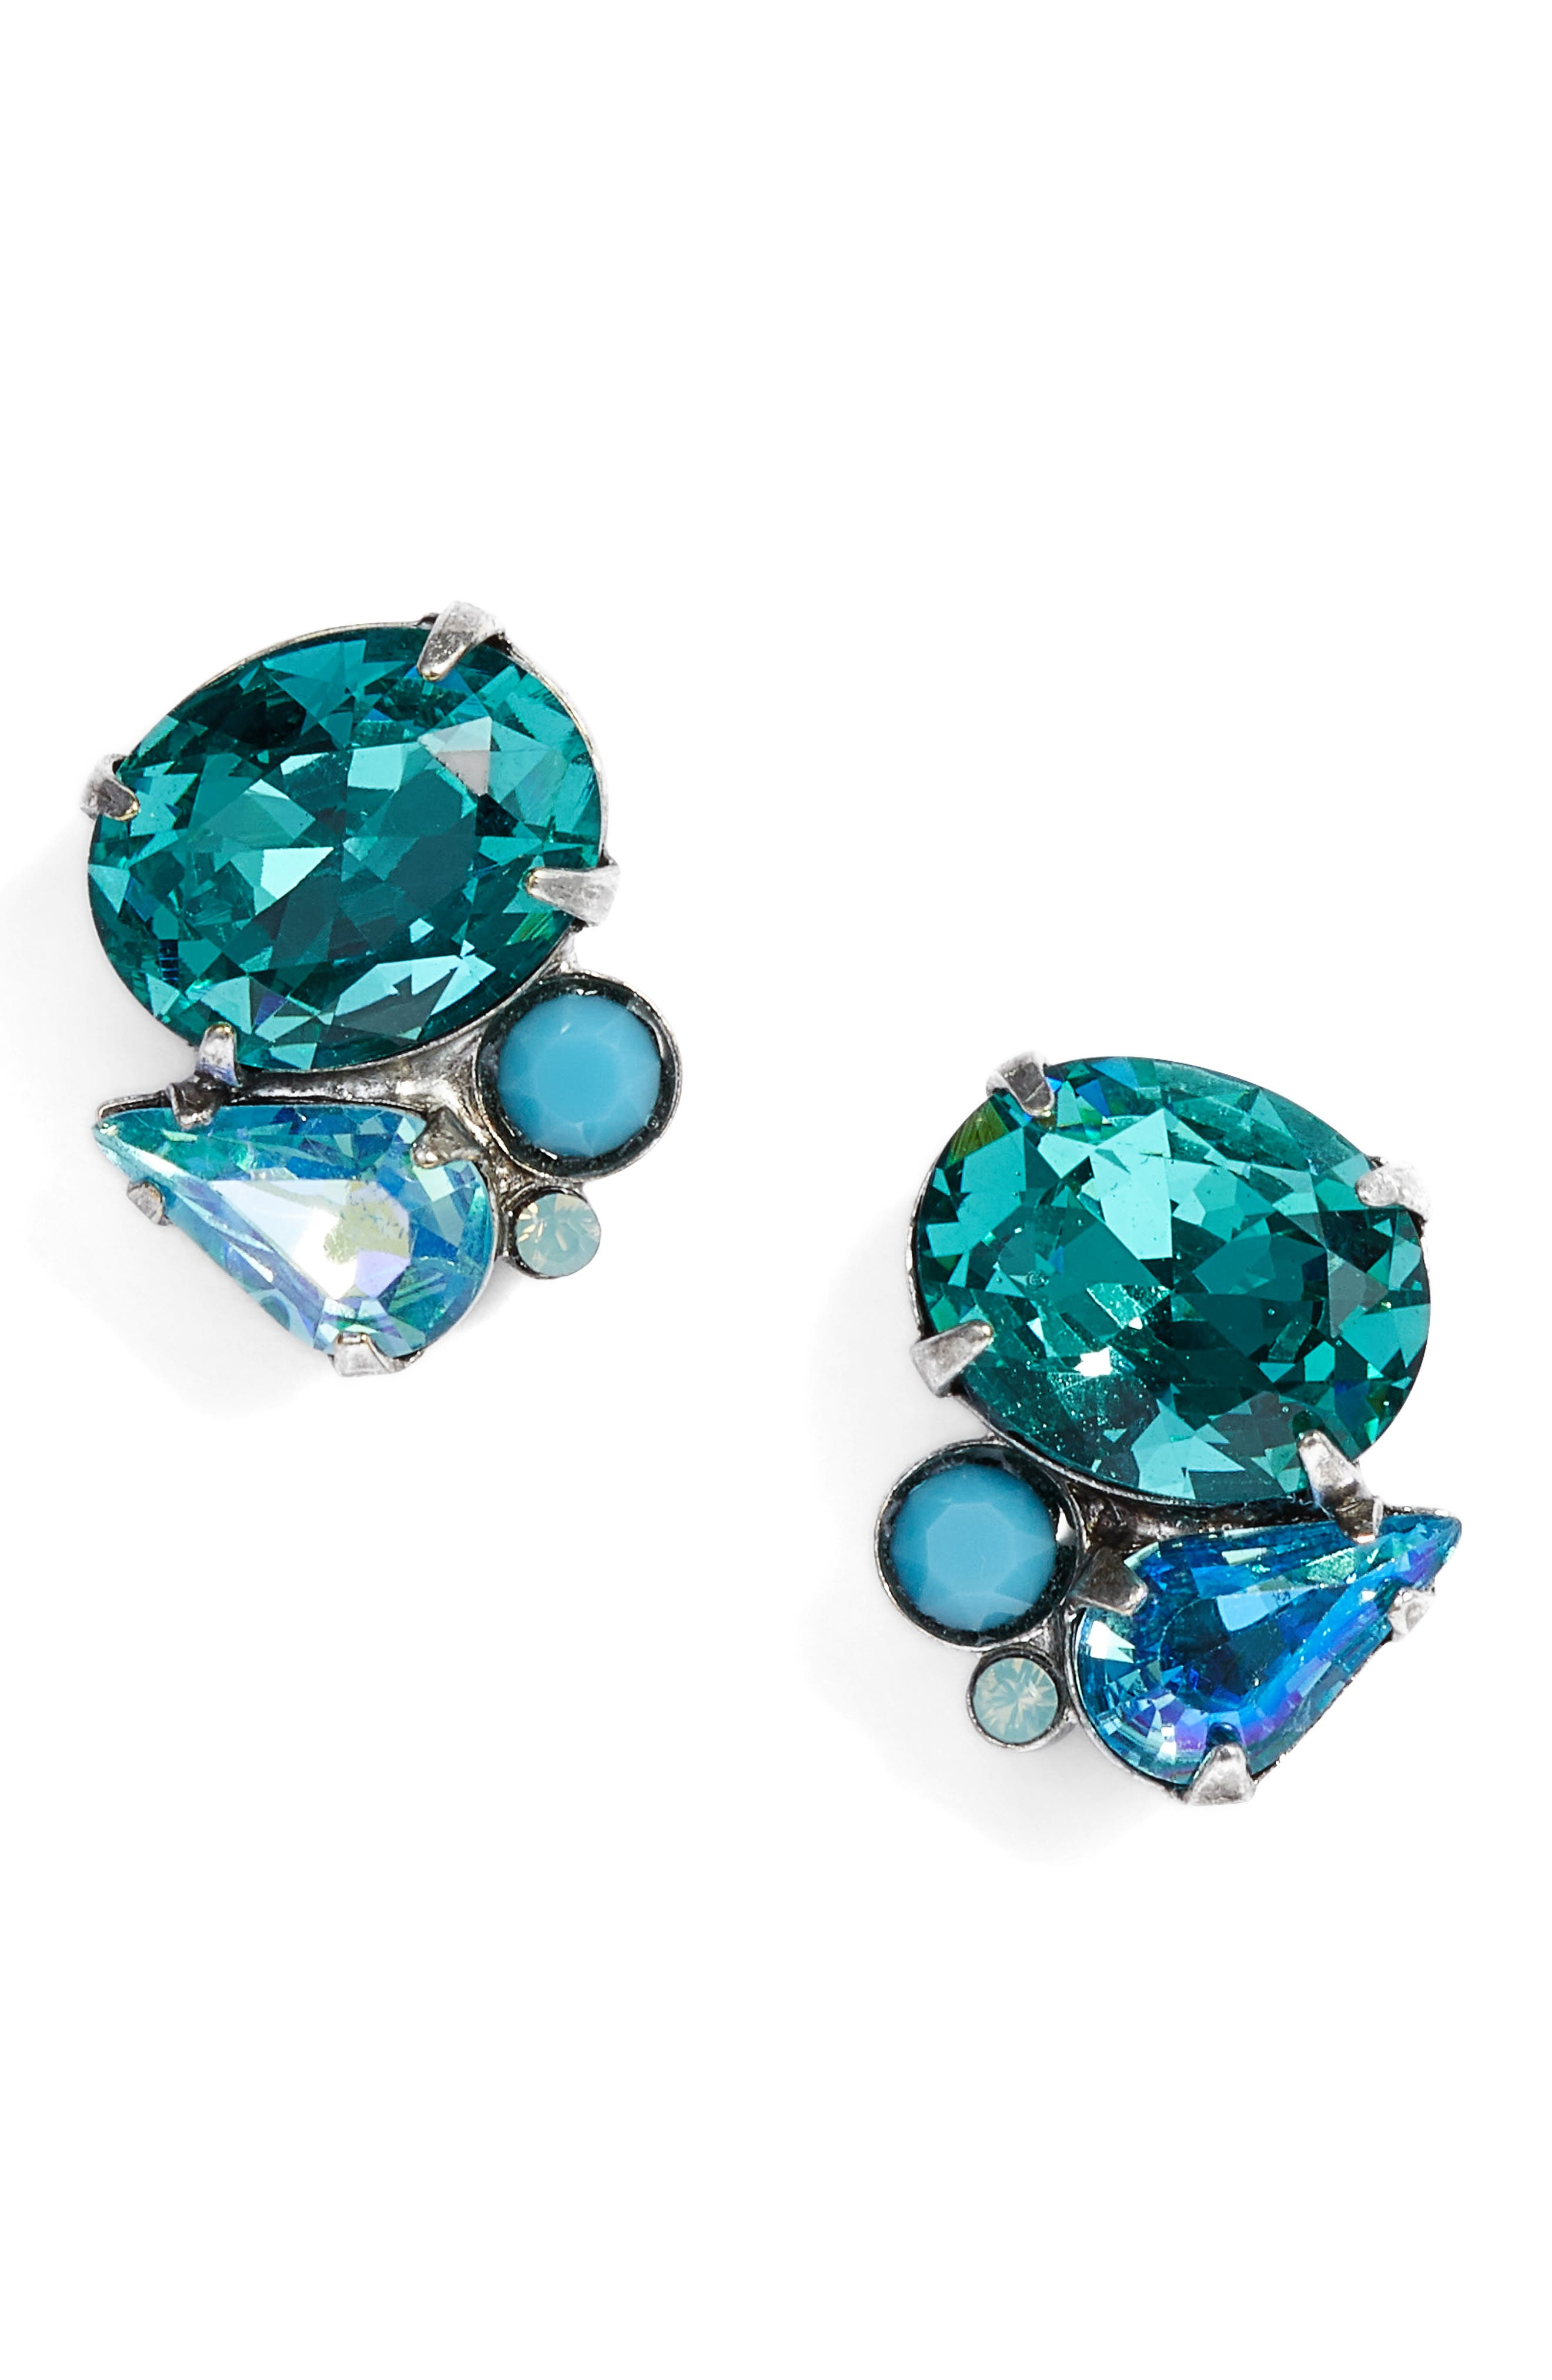 Mayflower Crystal Earrings,                             Main thumbnail 1, color,                             Blue-Green